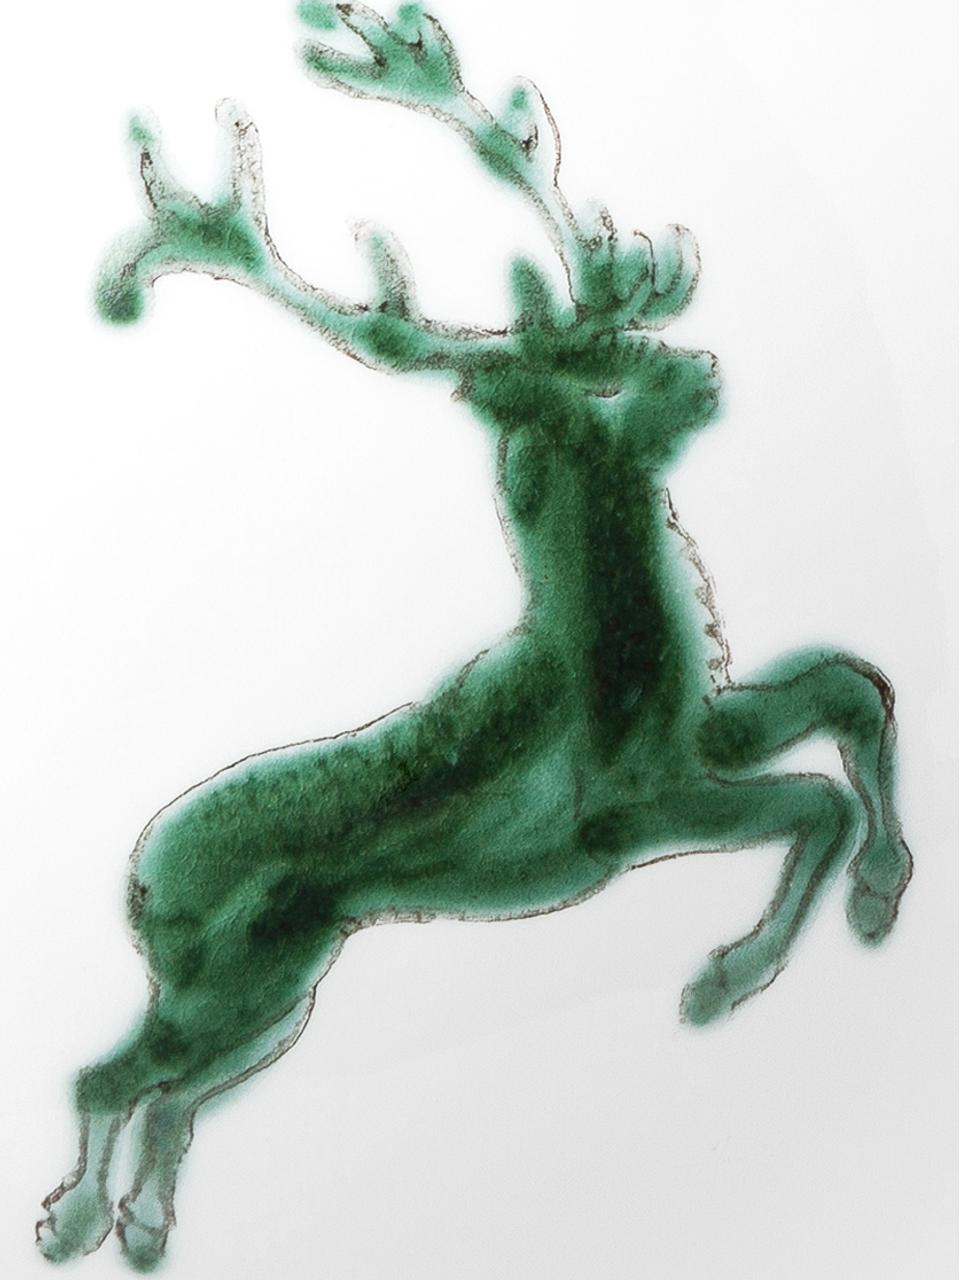 Handbeschilderde theepot Classic Green Deer, 500 ml, Keramiek, Groen, wit, 500 ml